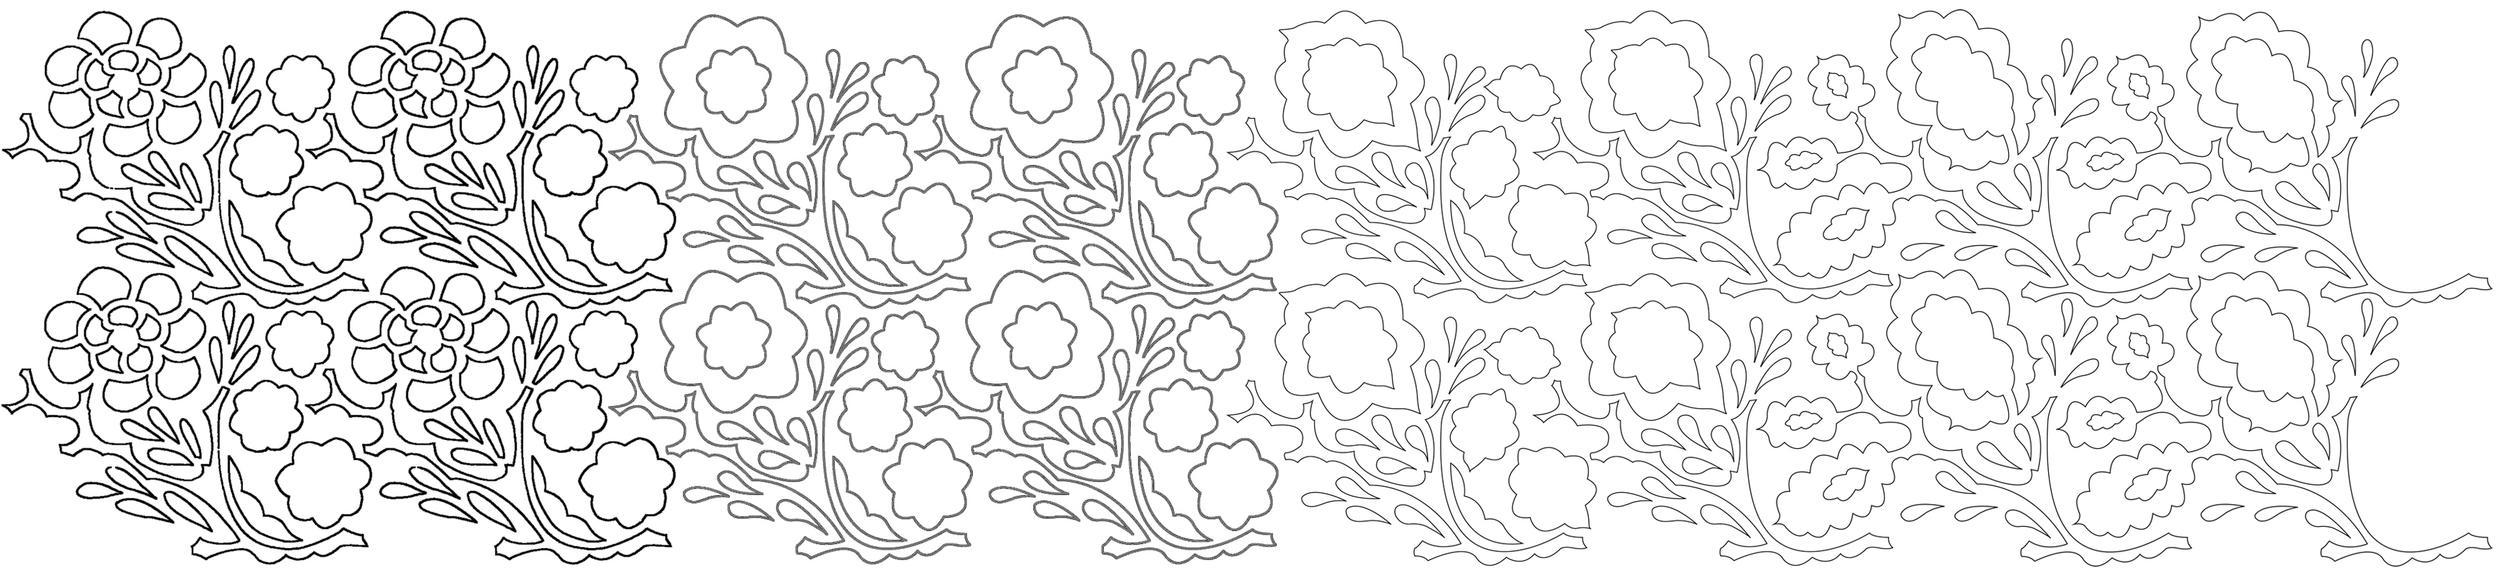 Pattern versions 2, 3, 4 & 5